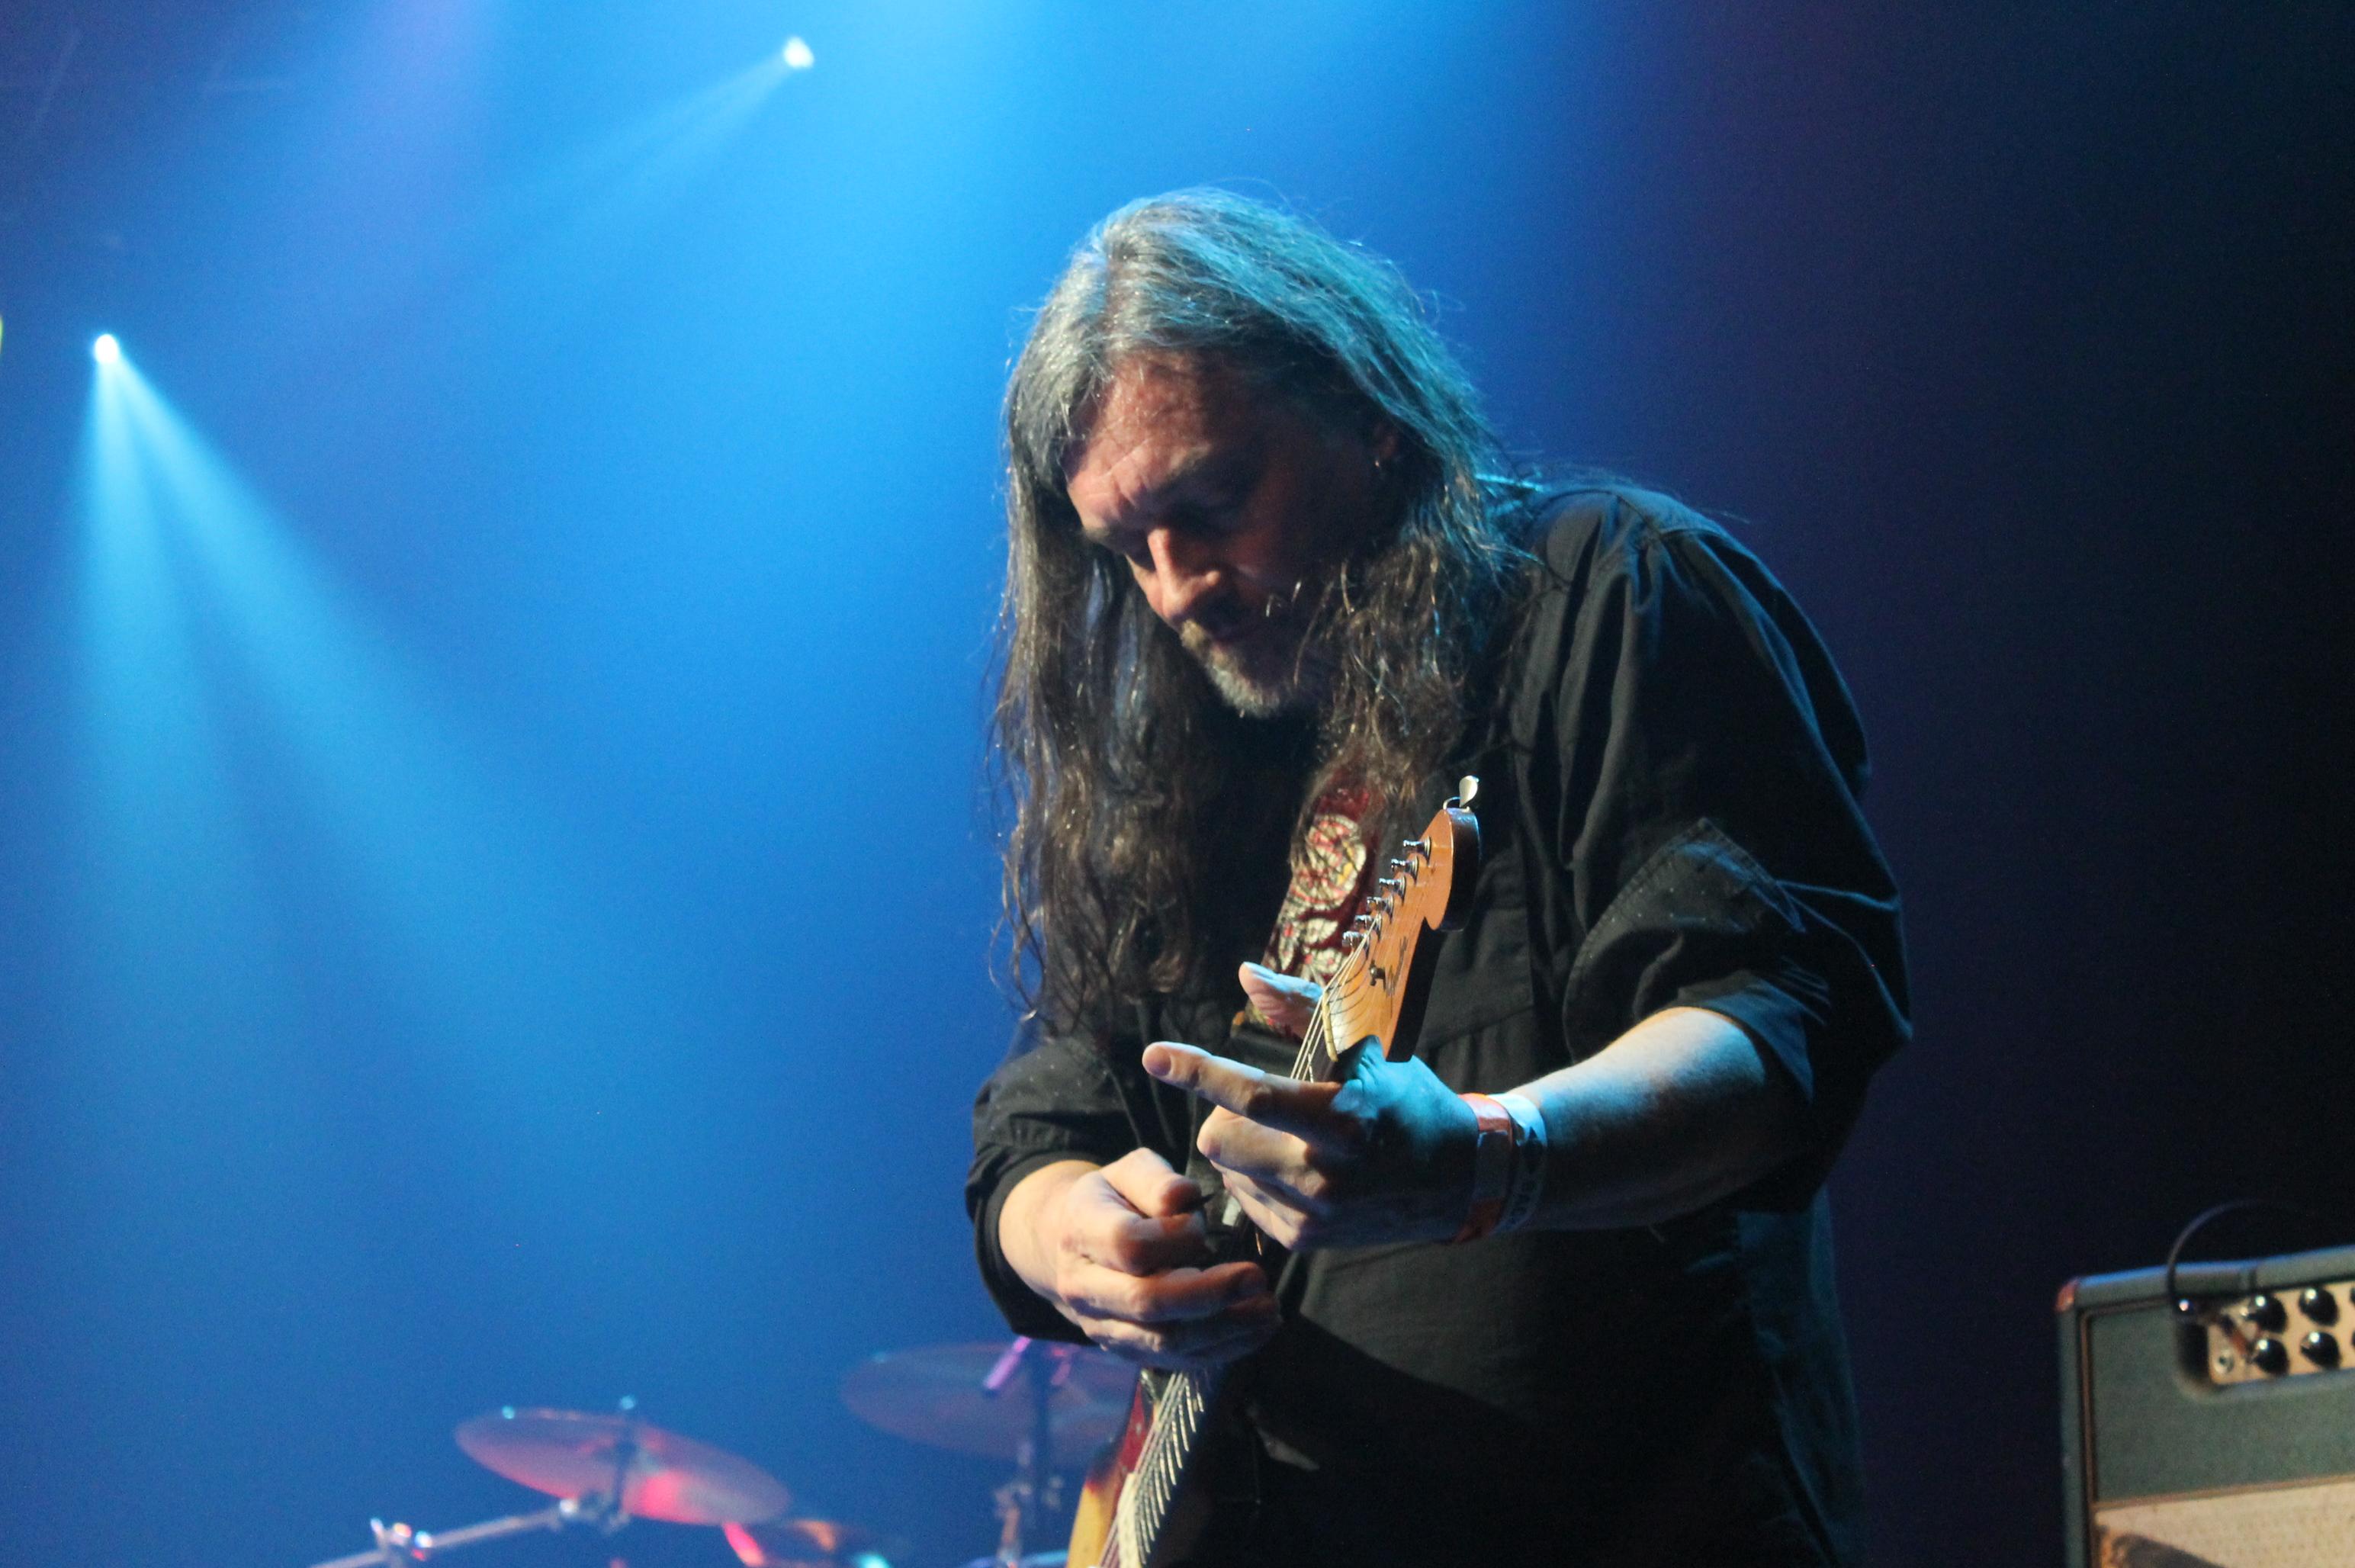 Marty Willson-Piper